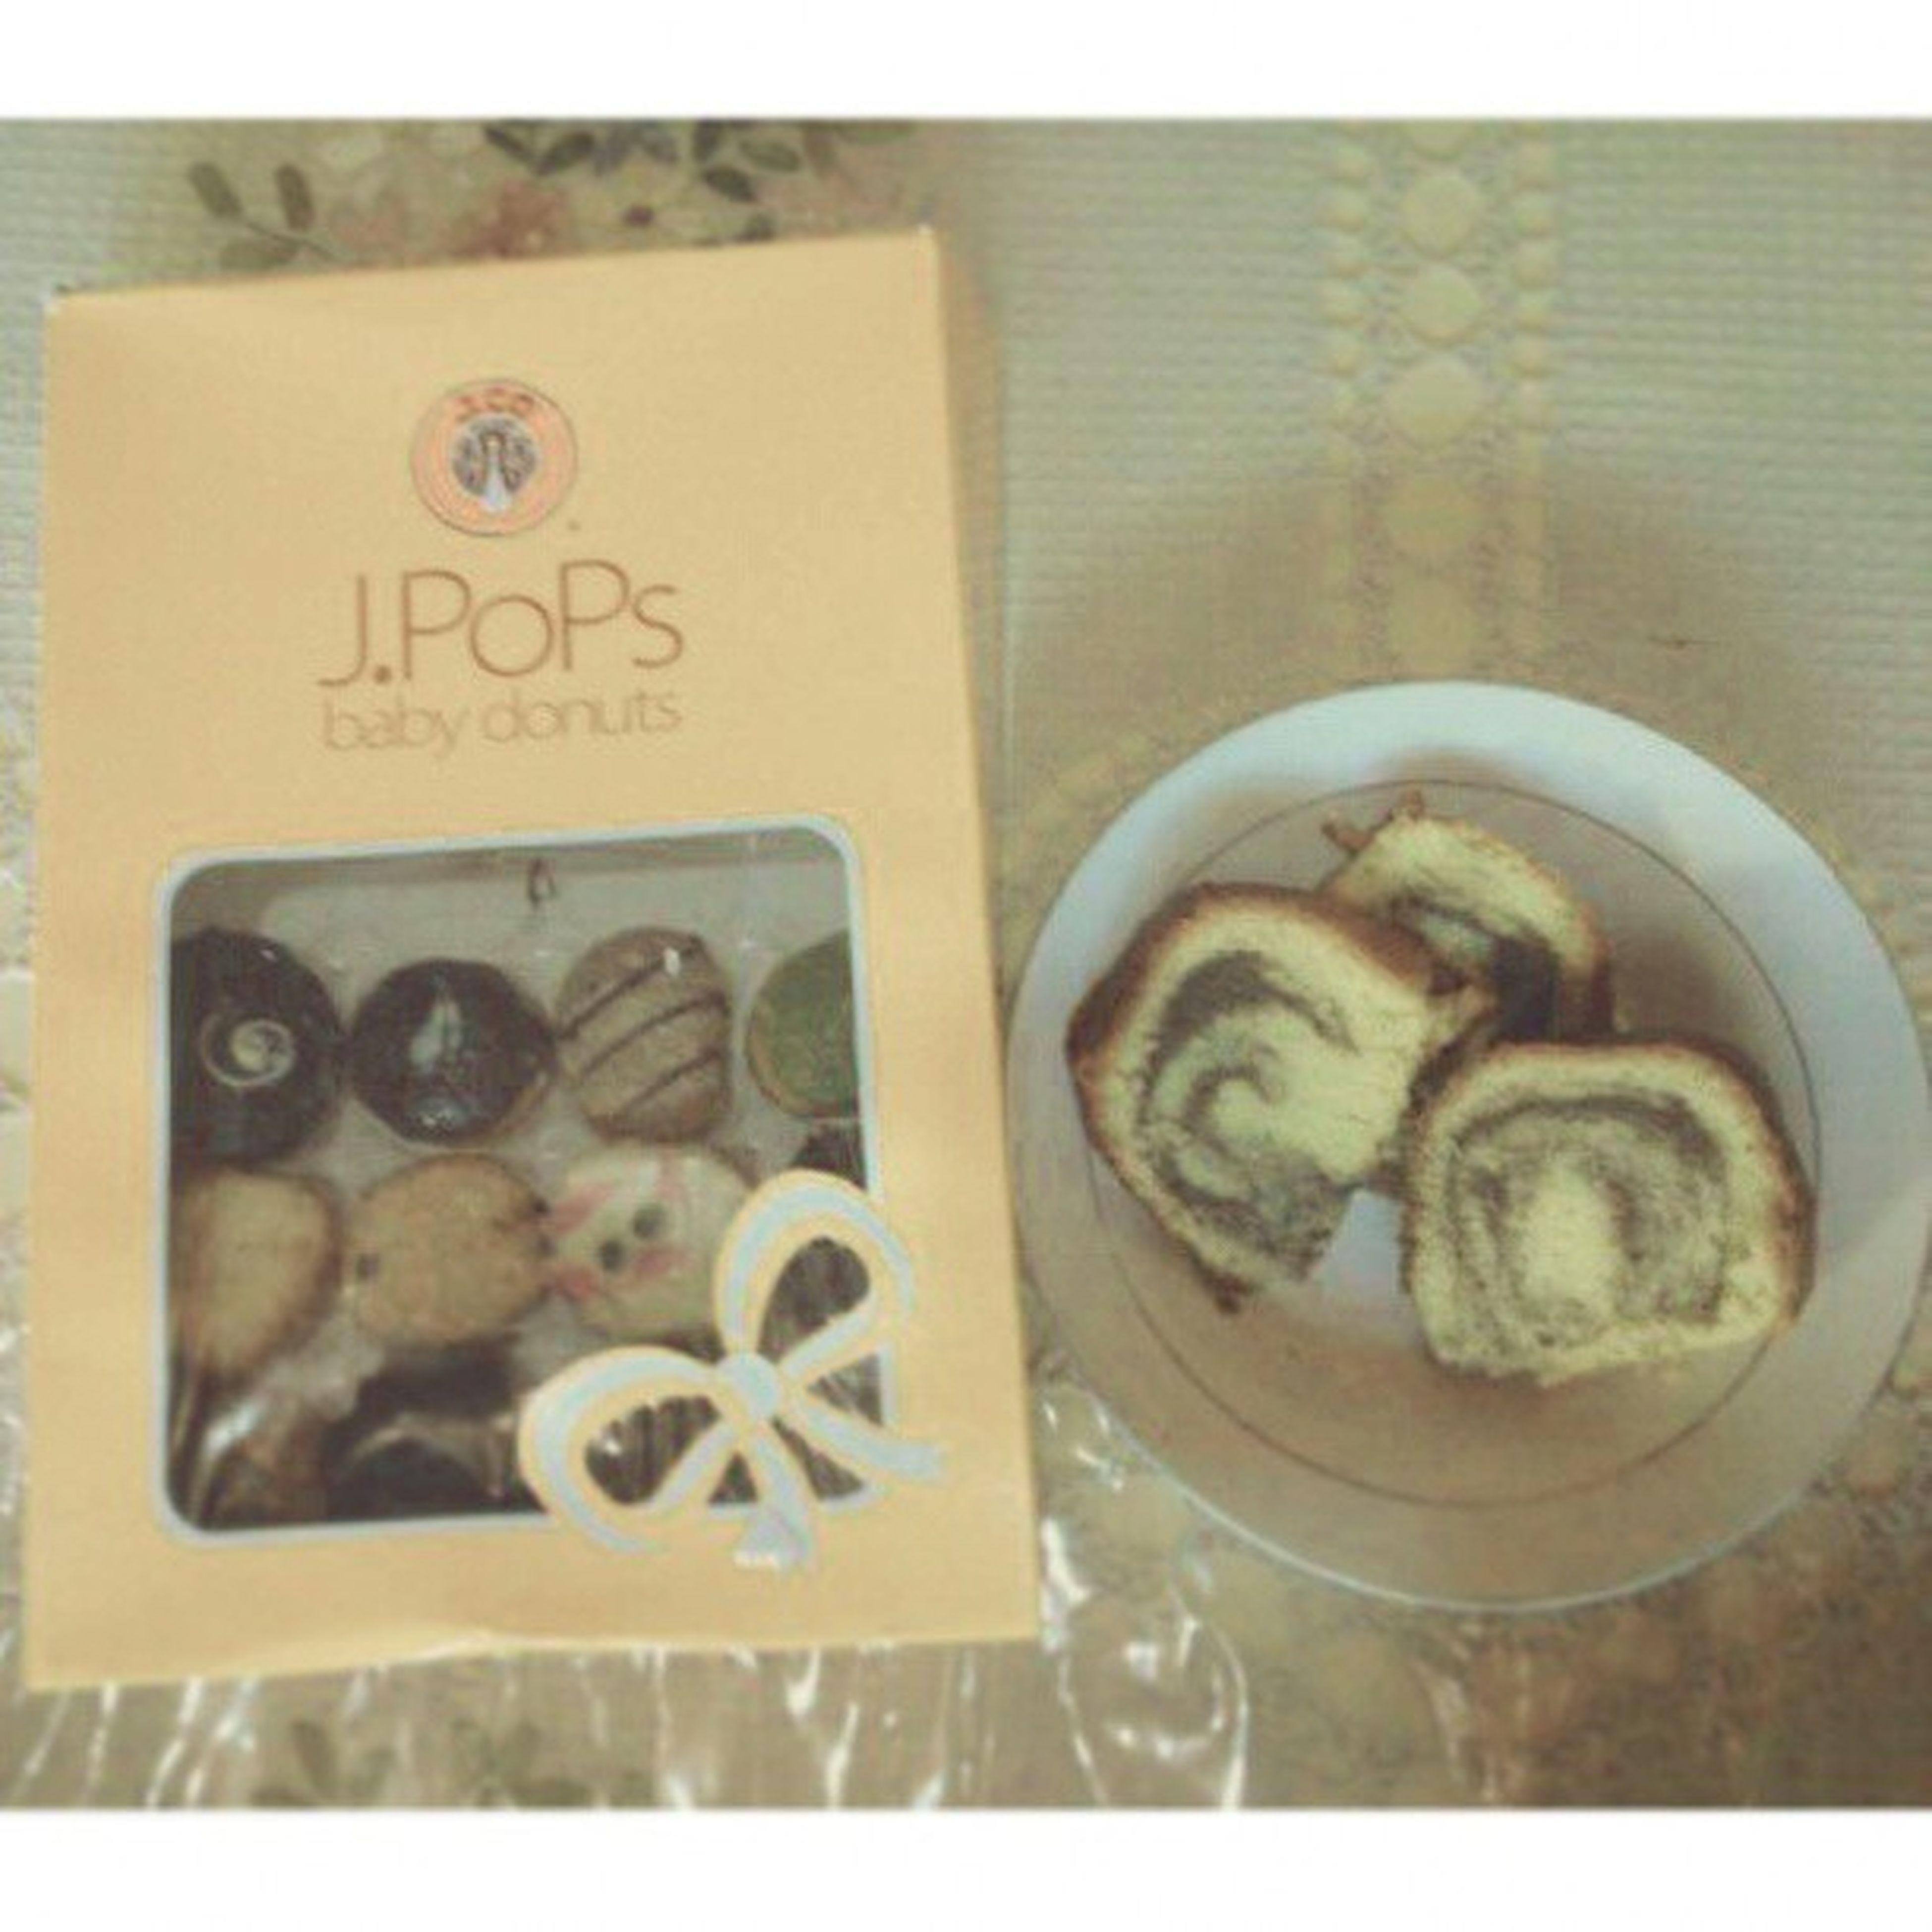 J.Co vs B.Olu Aceh Meulaboh Leuhan Traditional Cake